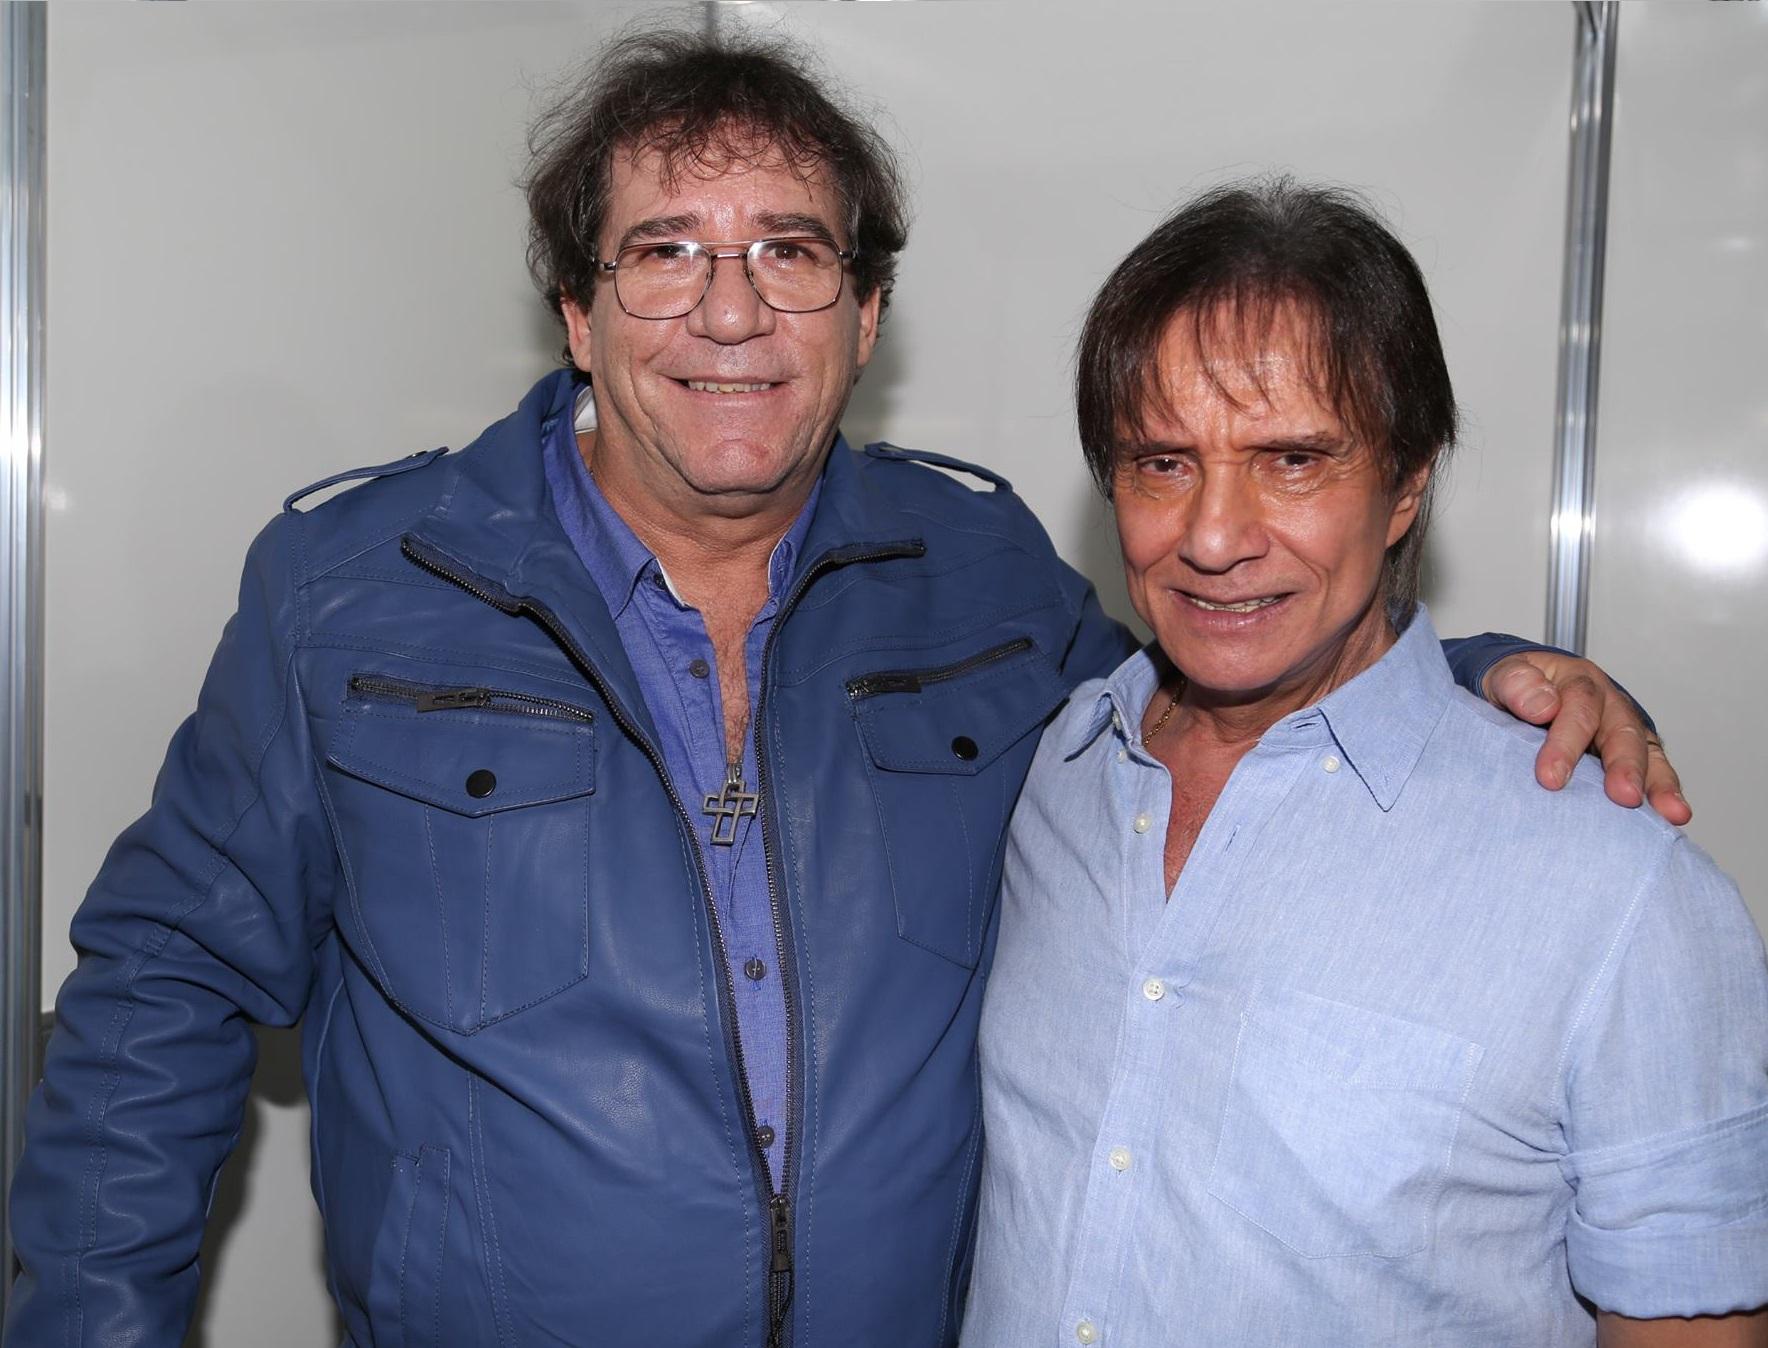 Enzo Gonçalves de Almeida